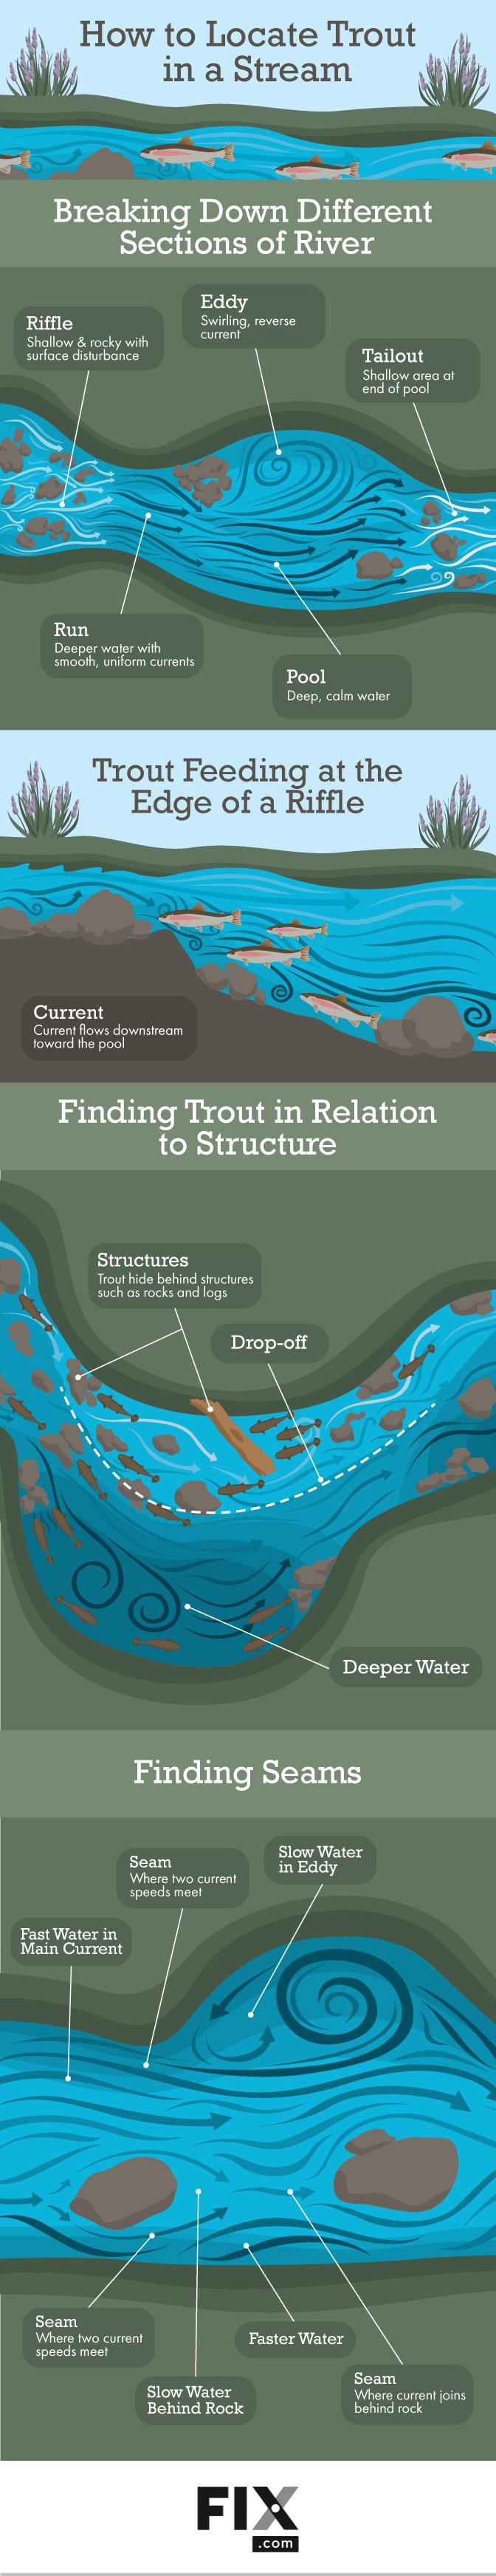 locate trouts in a stream